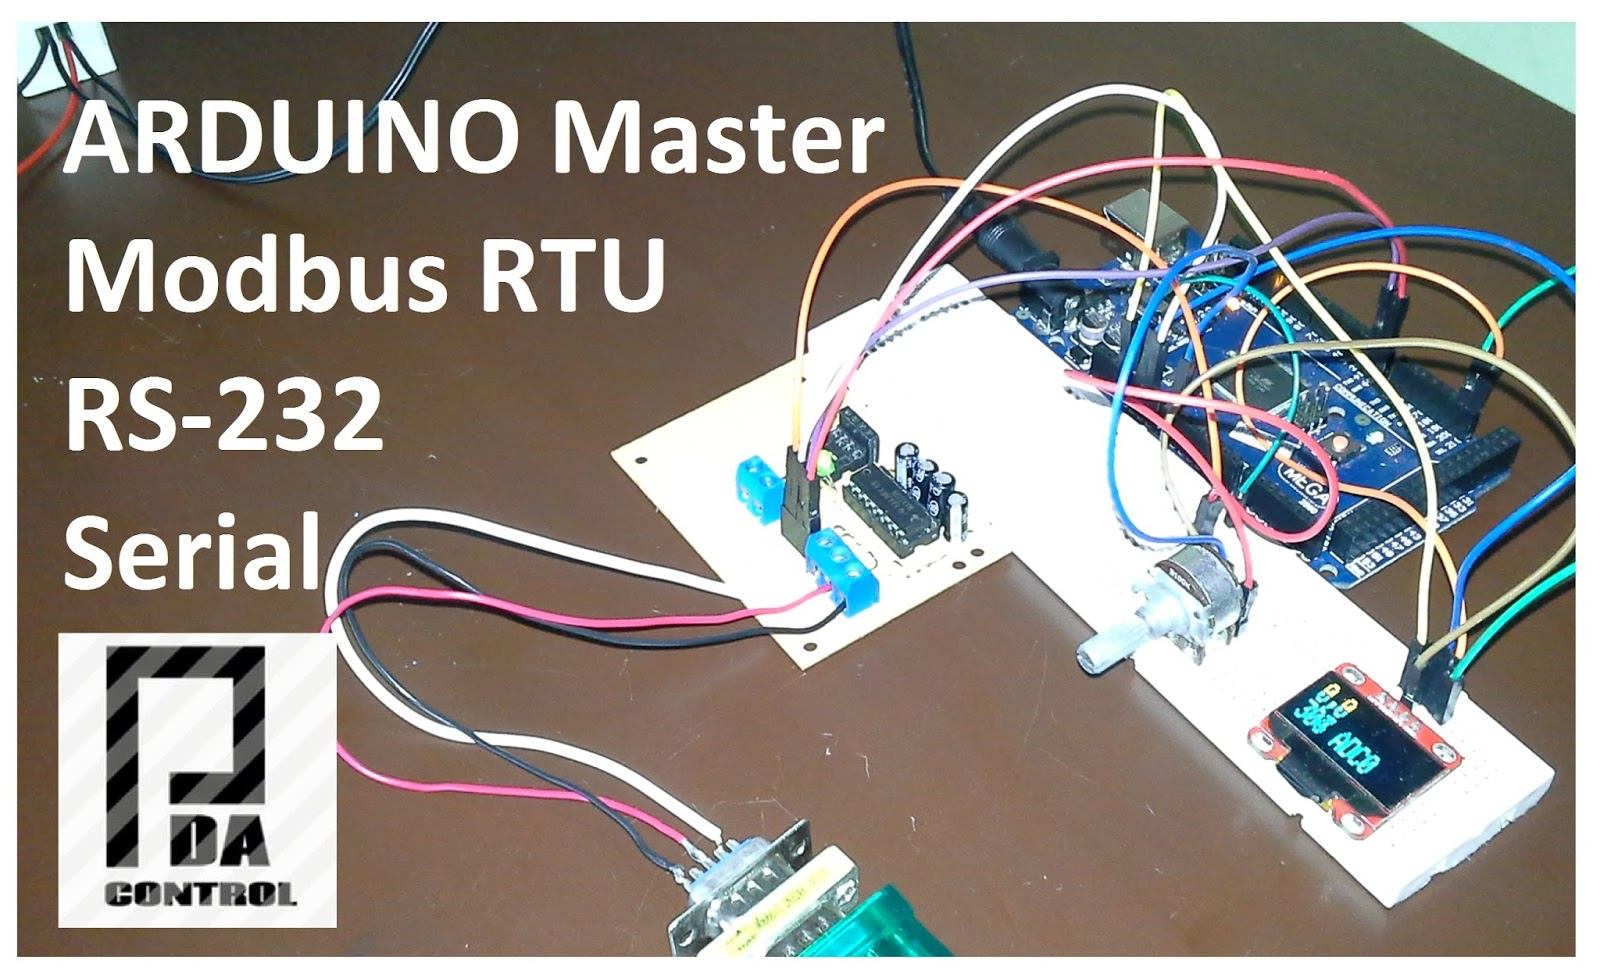 Pruebas Modbus RTU Maestro con Arduino  via RS232  Parte 2